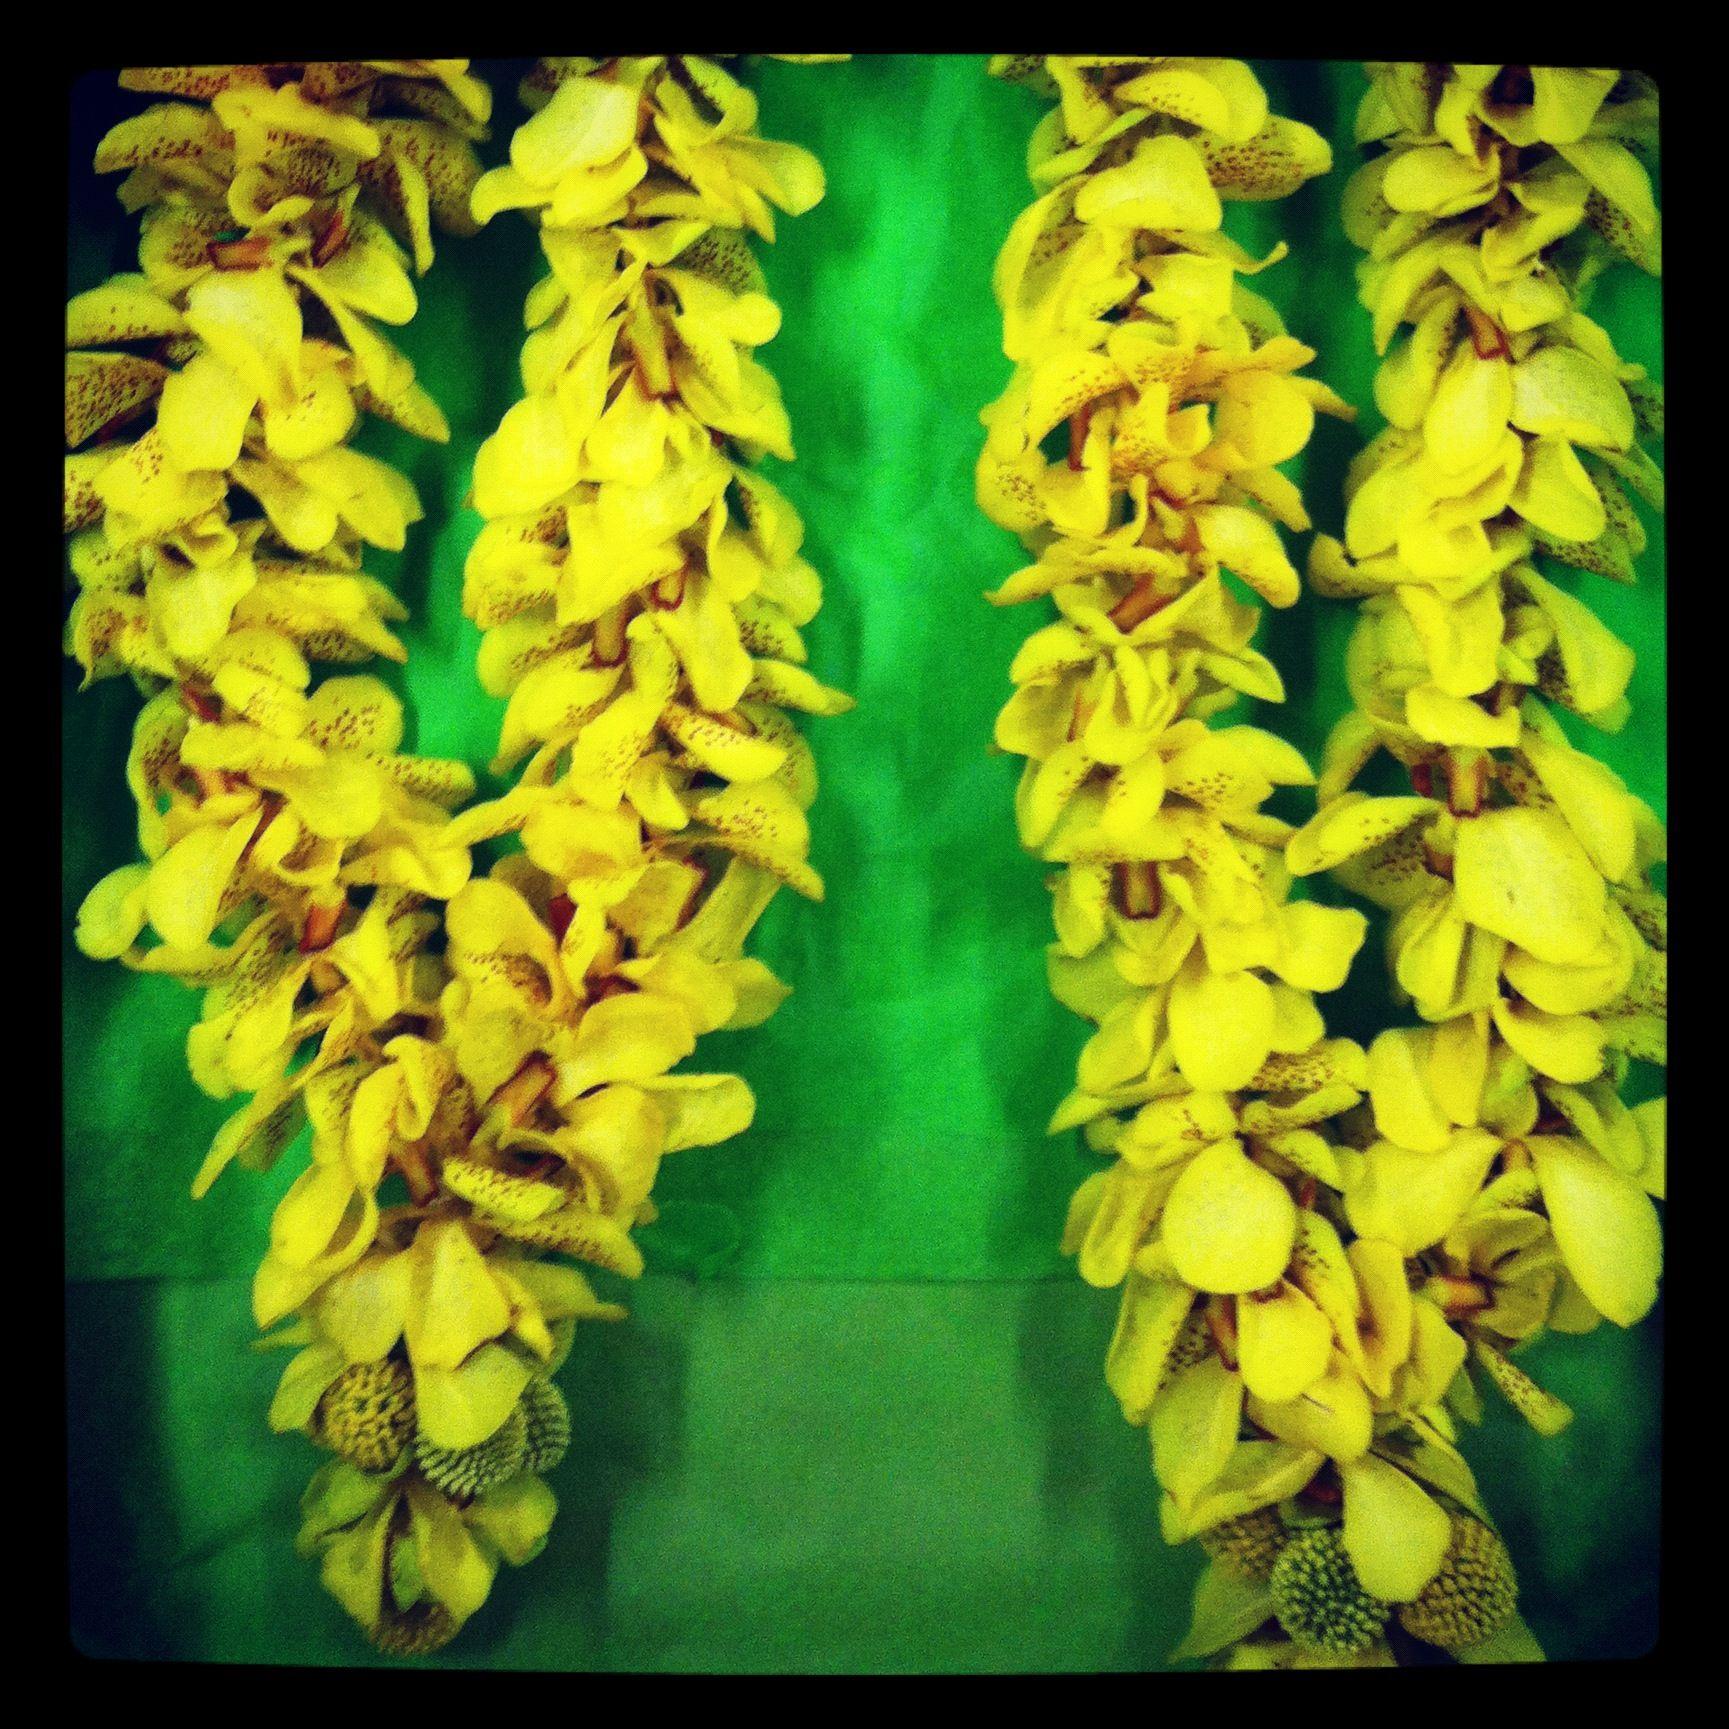 Traditional Wedding Hindu Garlands Cost 65 55inches In Length Yellow Mokara Orchid Buy It At Www Noveltylei Garland Wedding Wedding Decorations Hindu Wedding